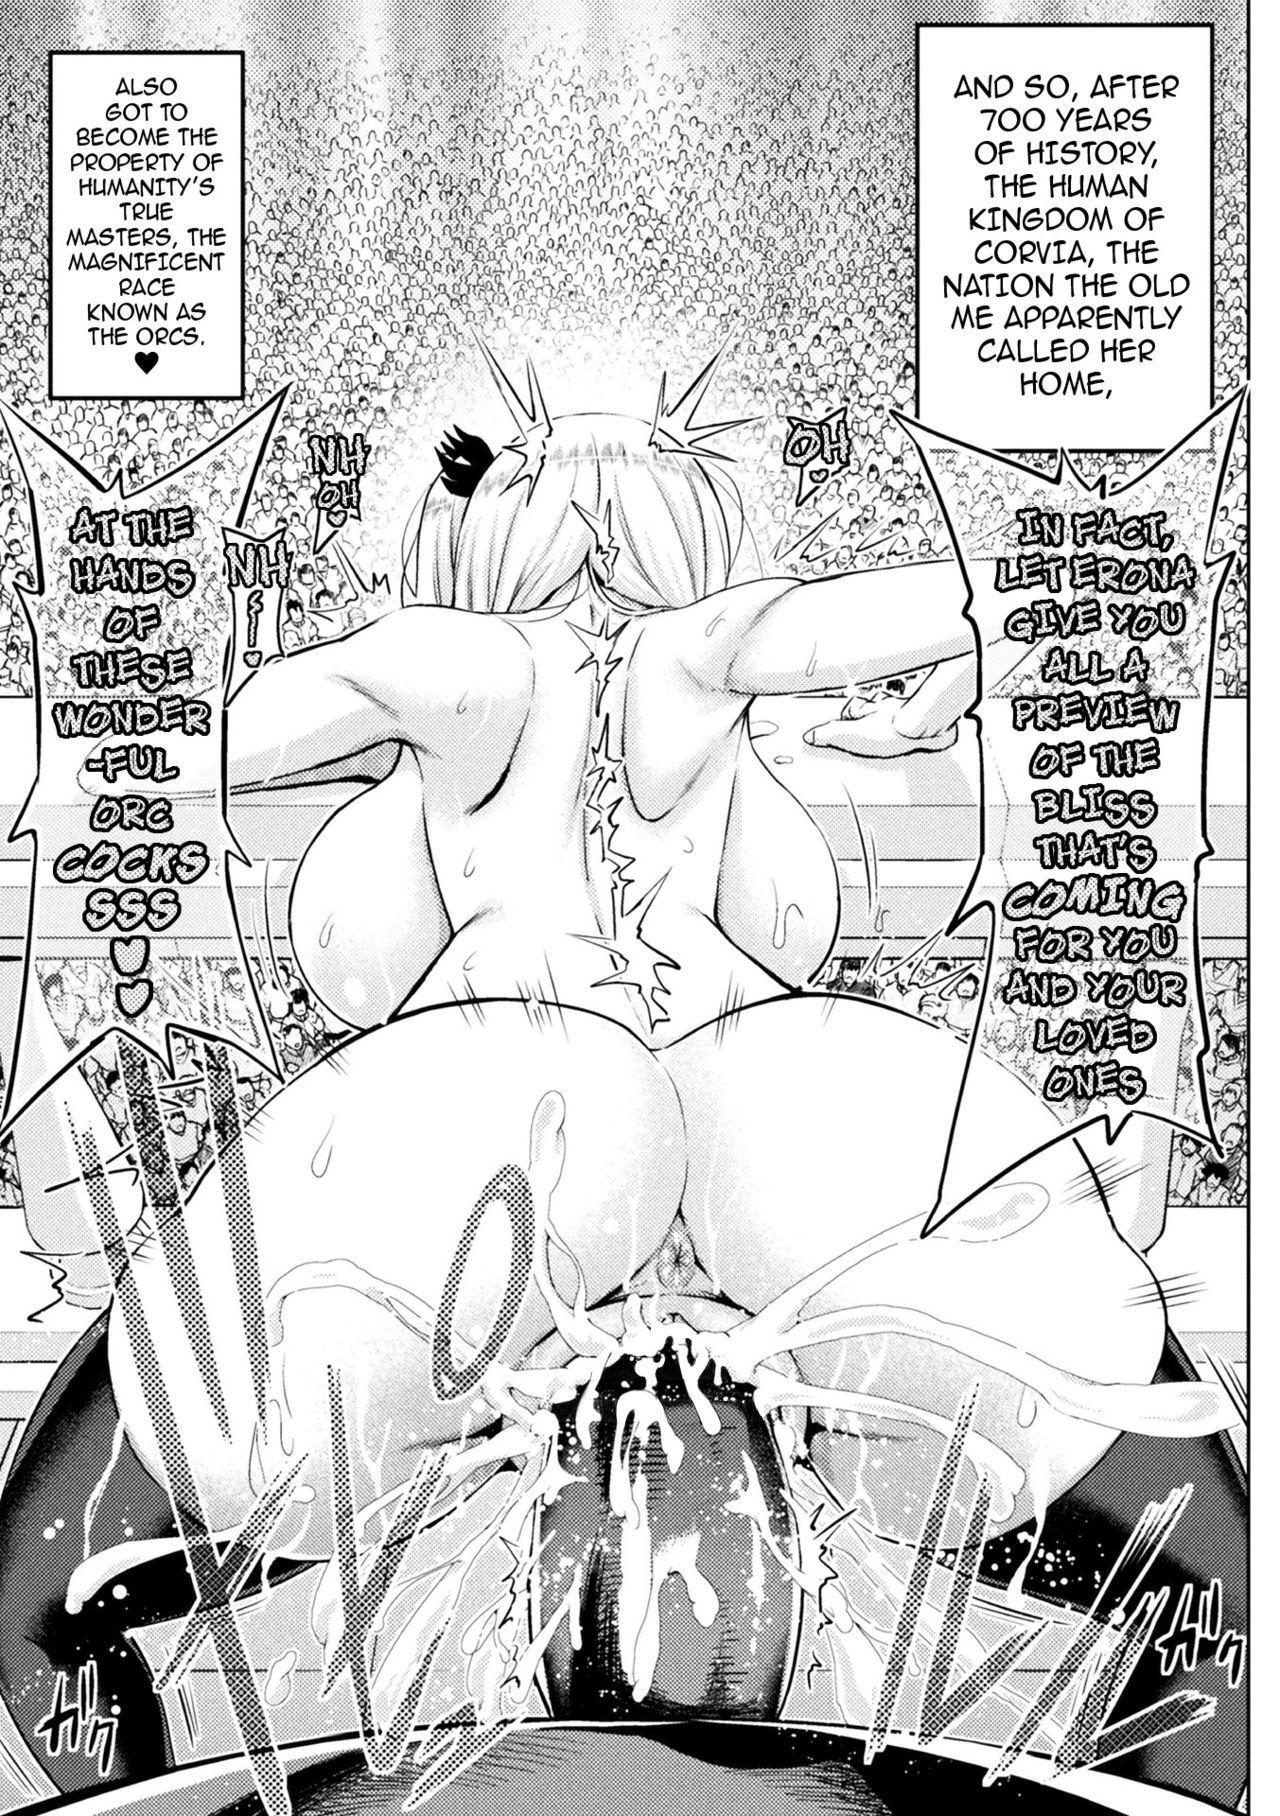 [Yamada Gogogo] Erona ~Orc no Inmon ni Okasareta Onna Kishi no Matsuro~ | Erona ~The Fall of a Beautiful Knight Cursed with the Lewd Mark of an Orc~ Ch. 1-6 [English] [darknight] [Decensored] [ongoing] 102